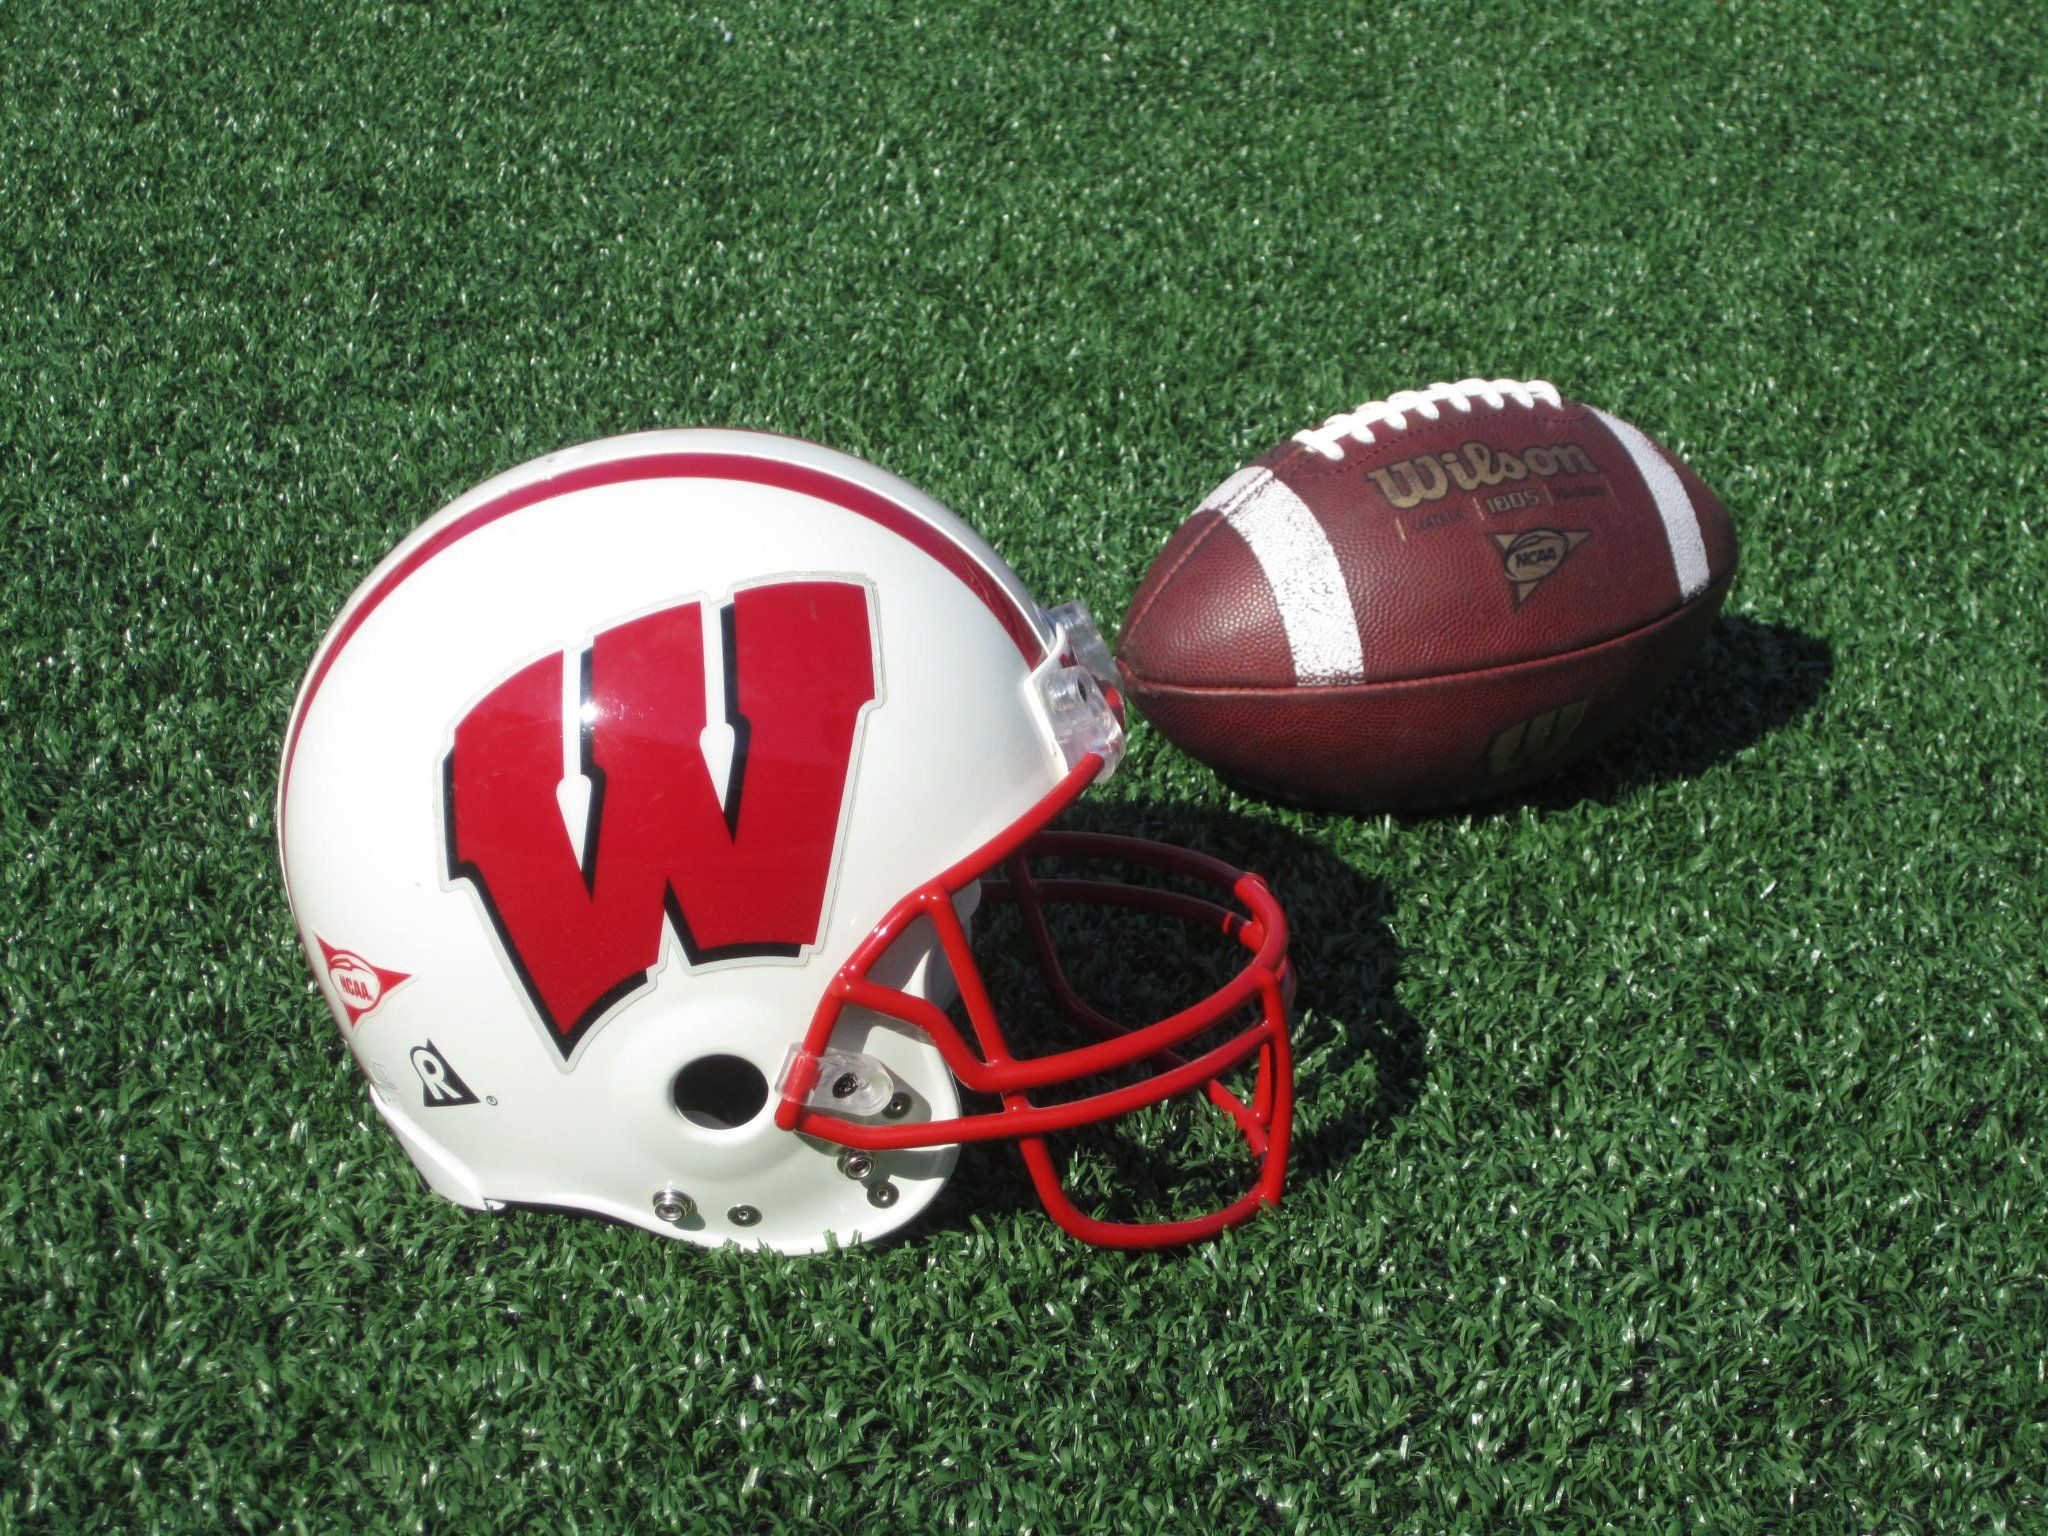 Wisconsin Badgers Football! Lets go! Badger football